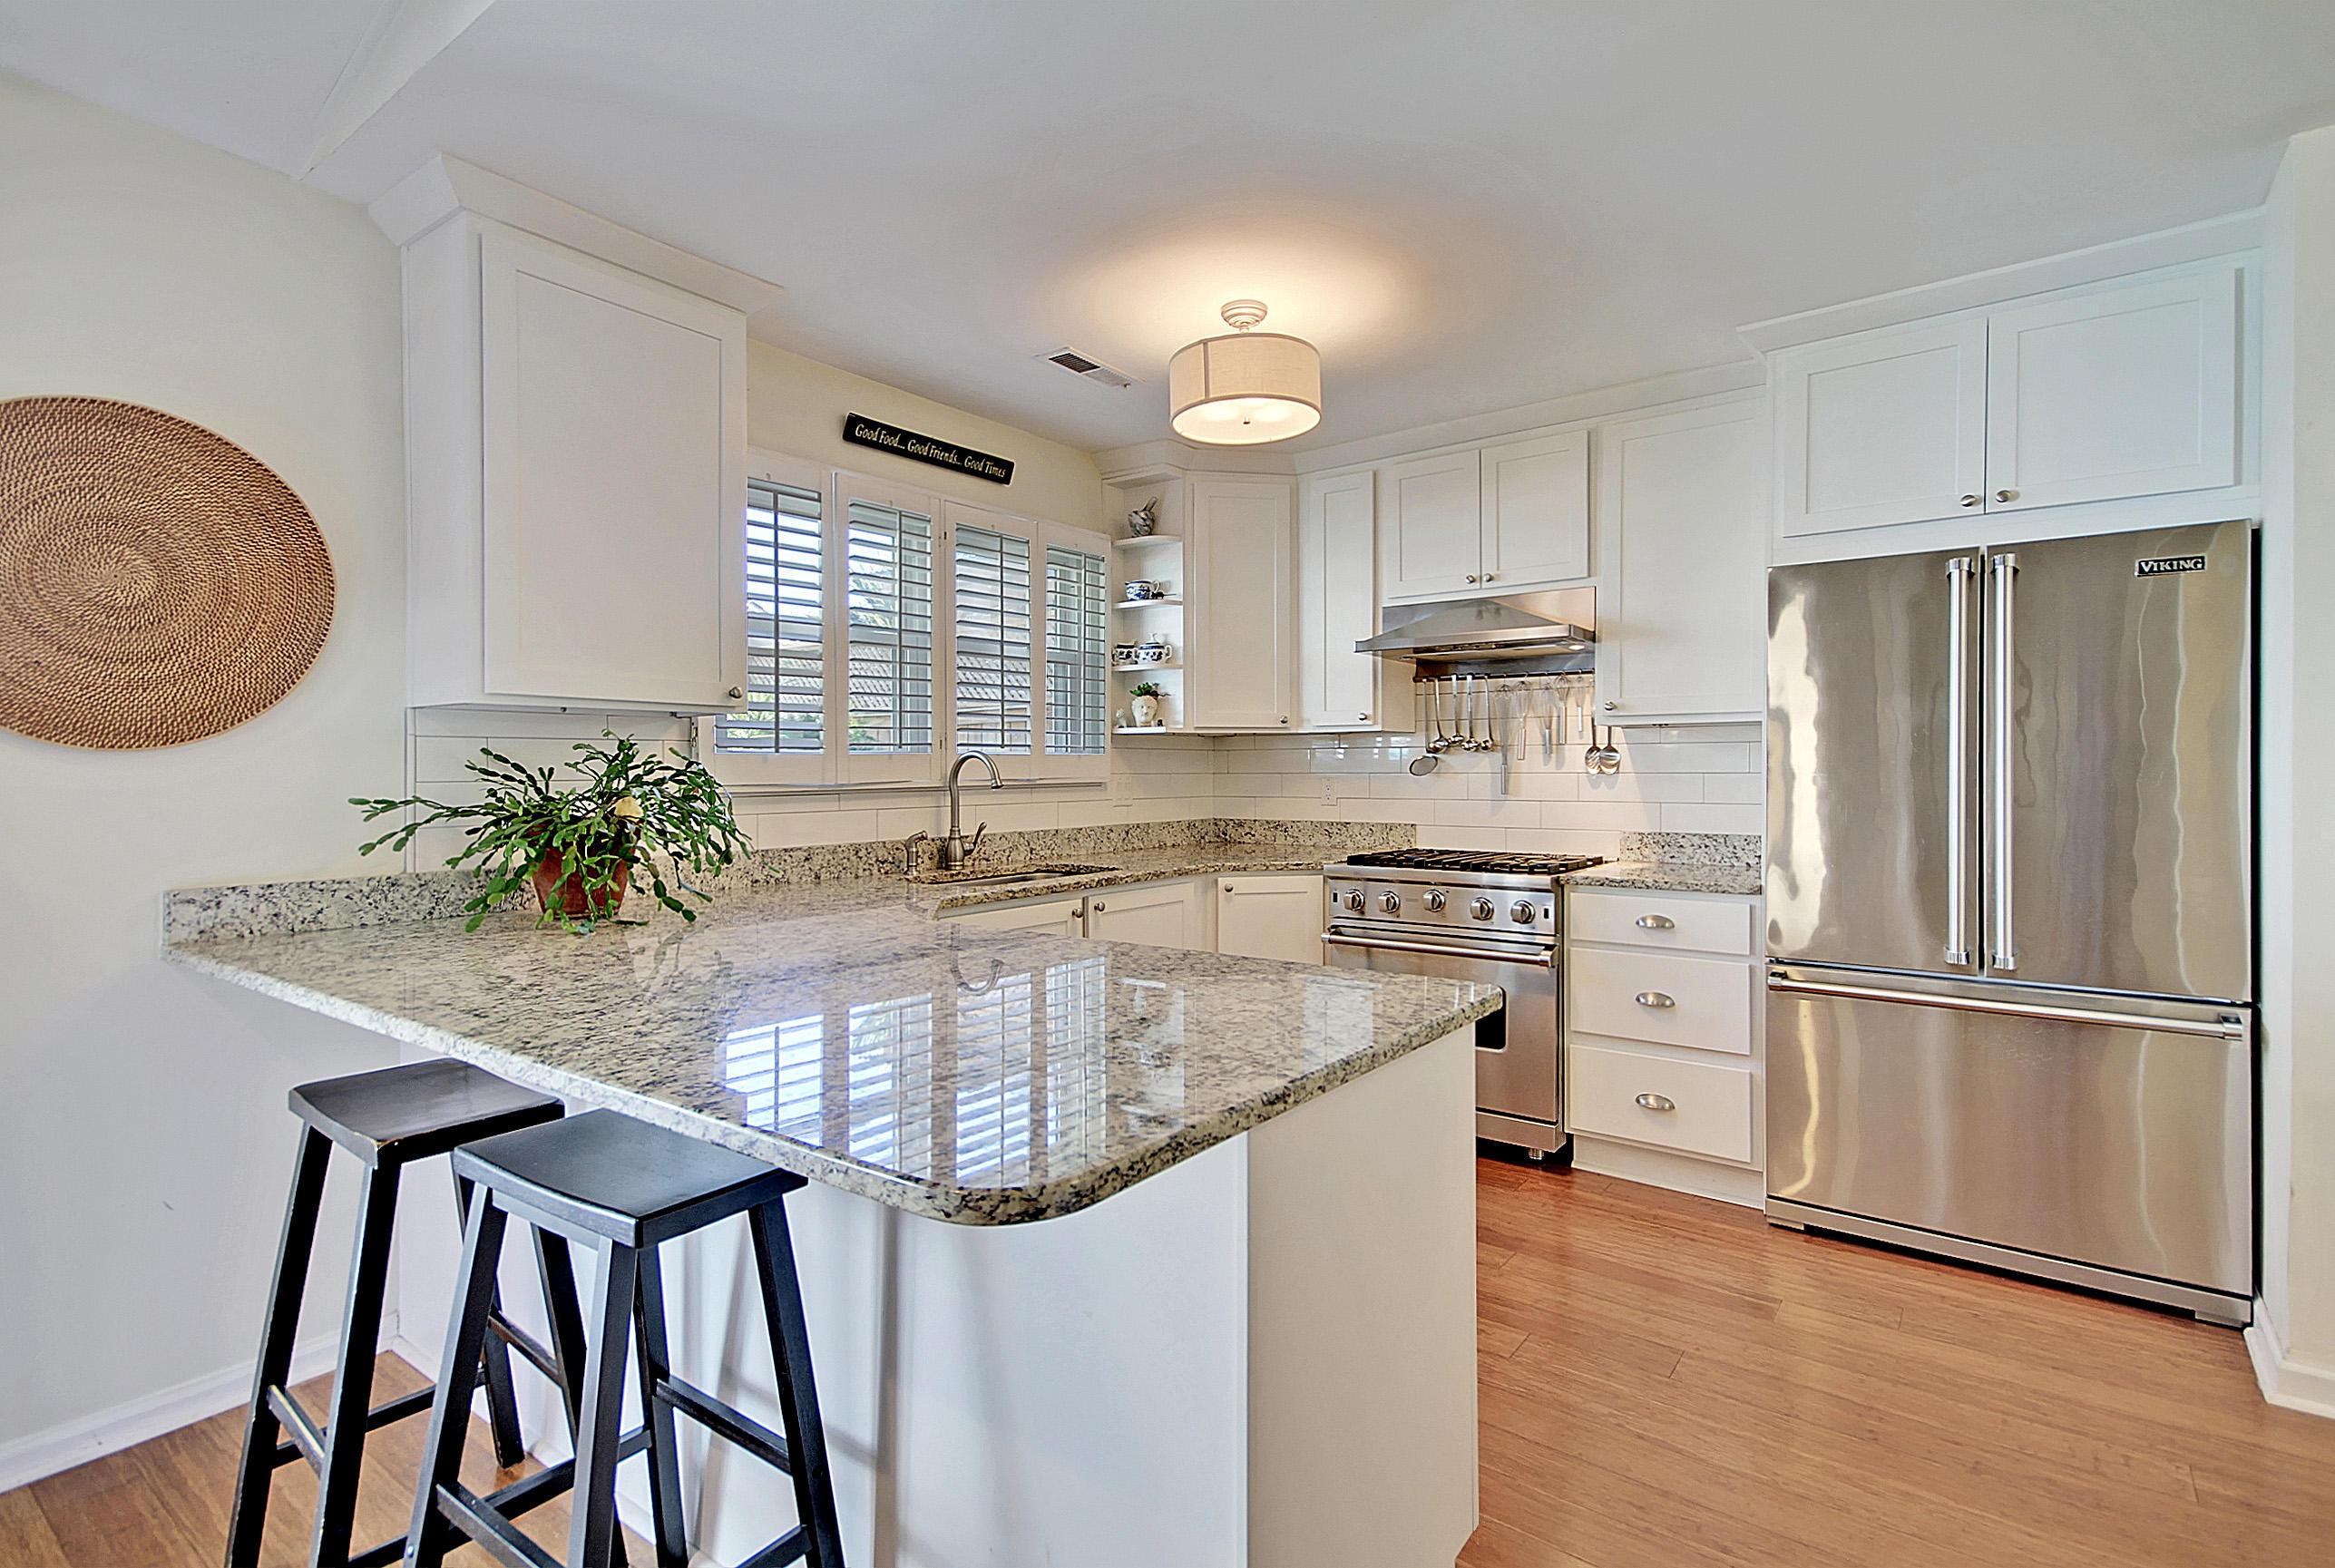 Pirates Cove Homes For Sale - 1492 Ketch, Mount Pleasant, SC - 32